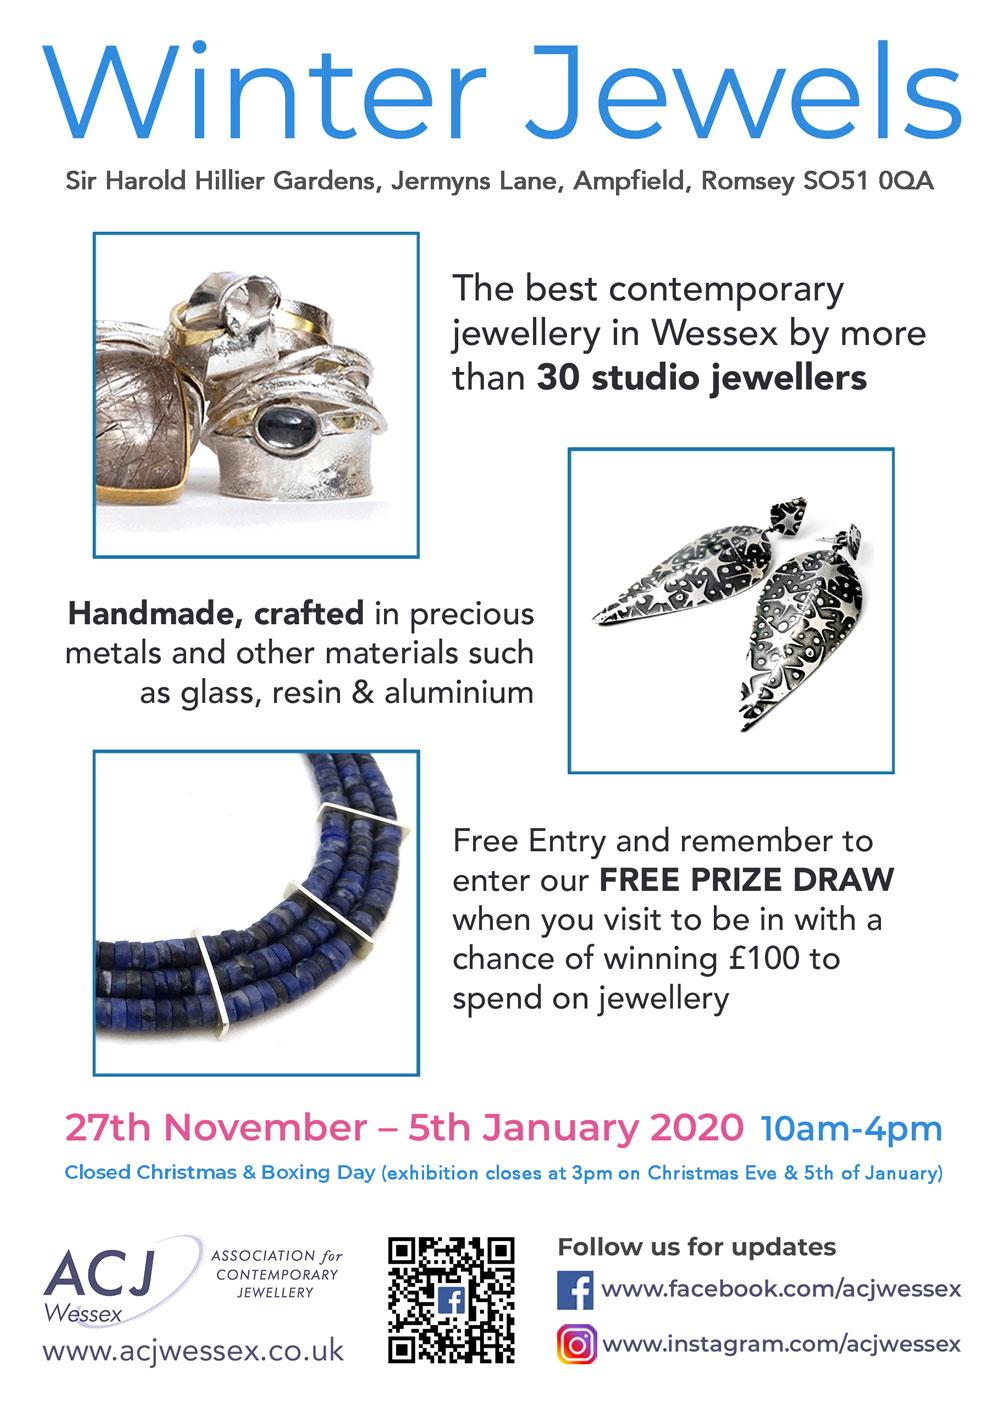 Winter Jewels Jewellery Exhibition Flyer 2